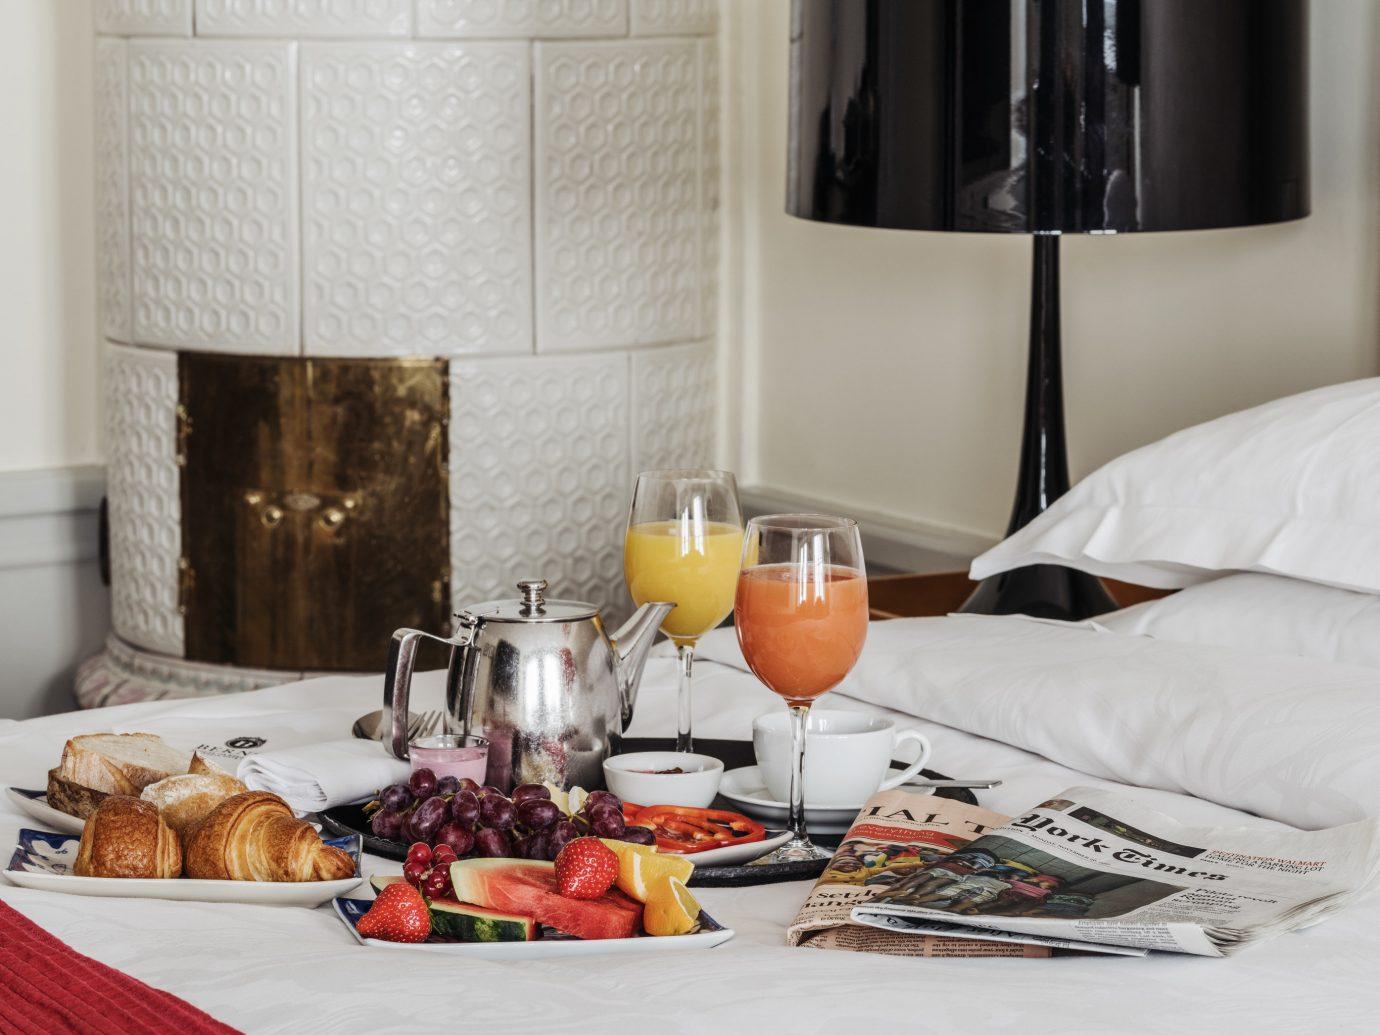 Hotels Stockholm Sweden indoor wall bed table stemware interior design tableware brunch wine glass breakfast